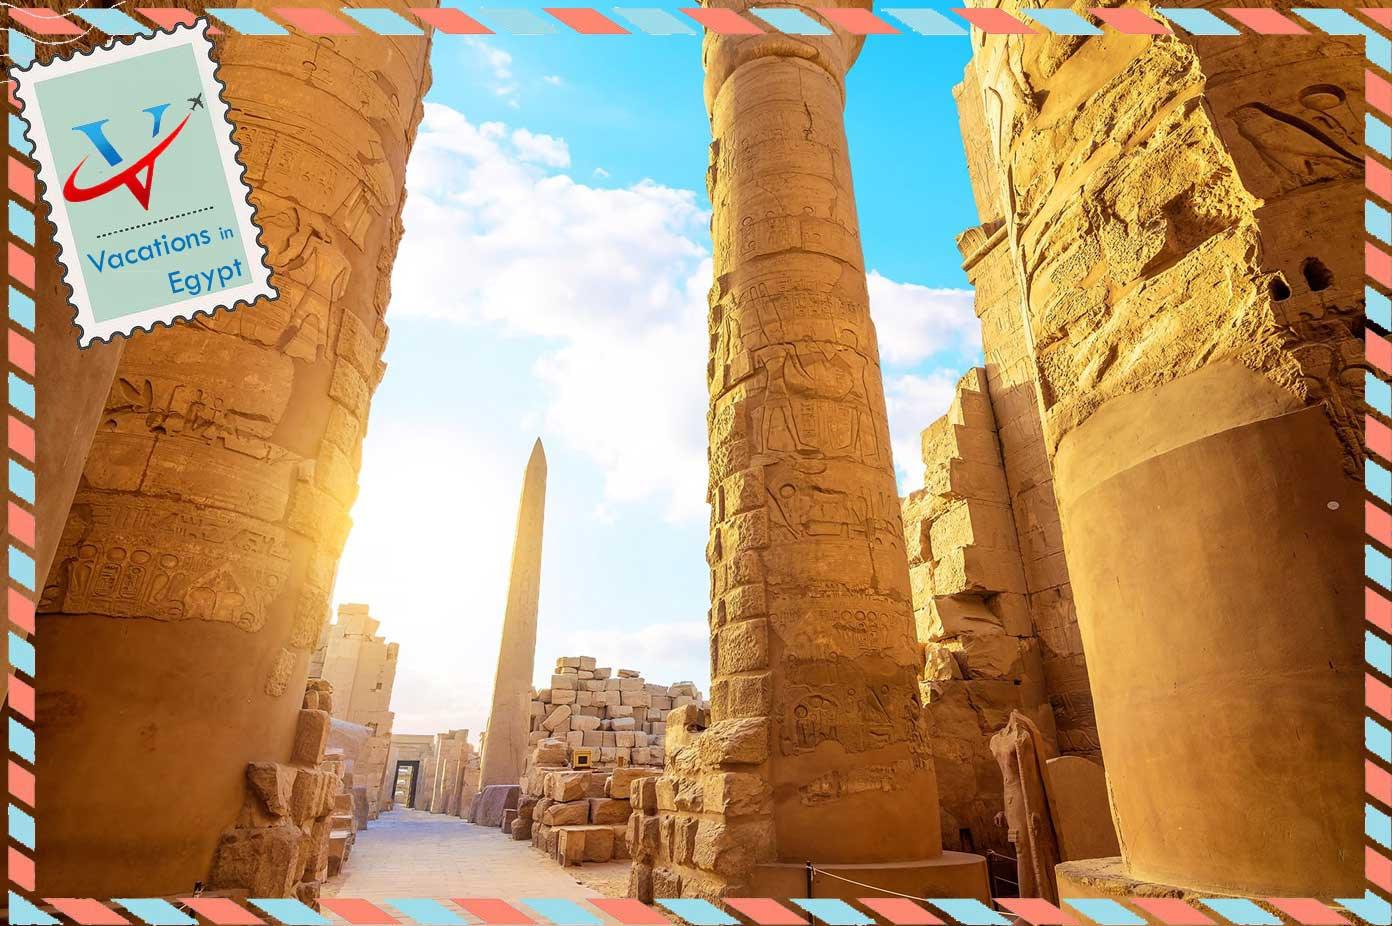 Luxor tour from sharm el sheikh